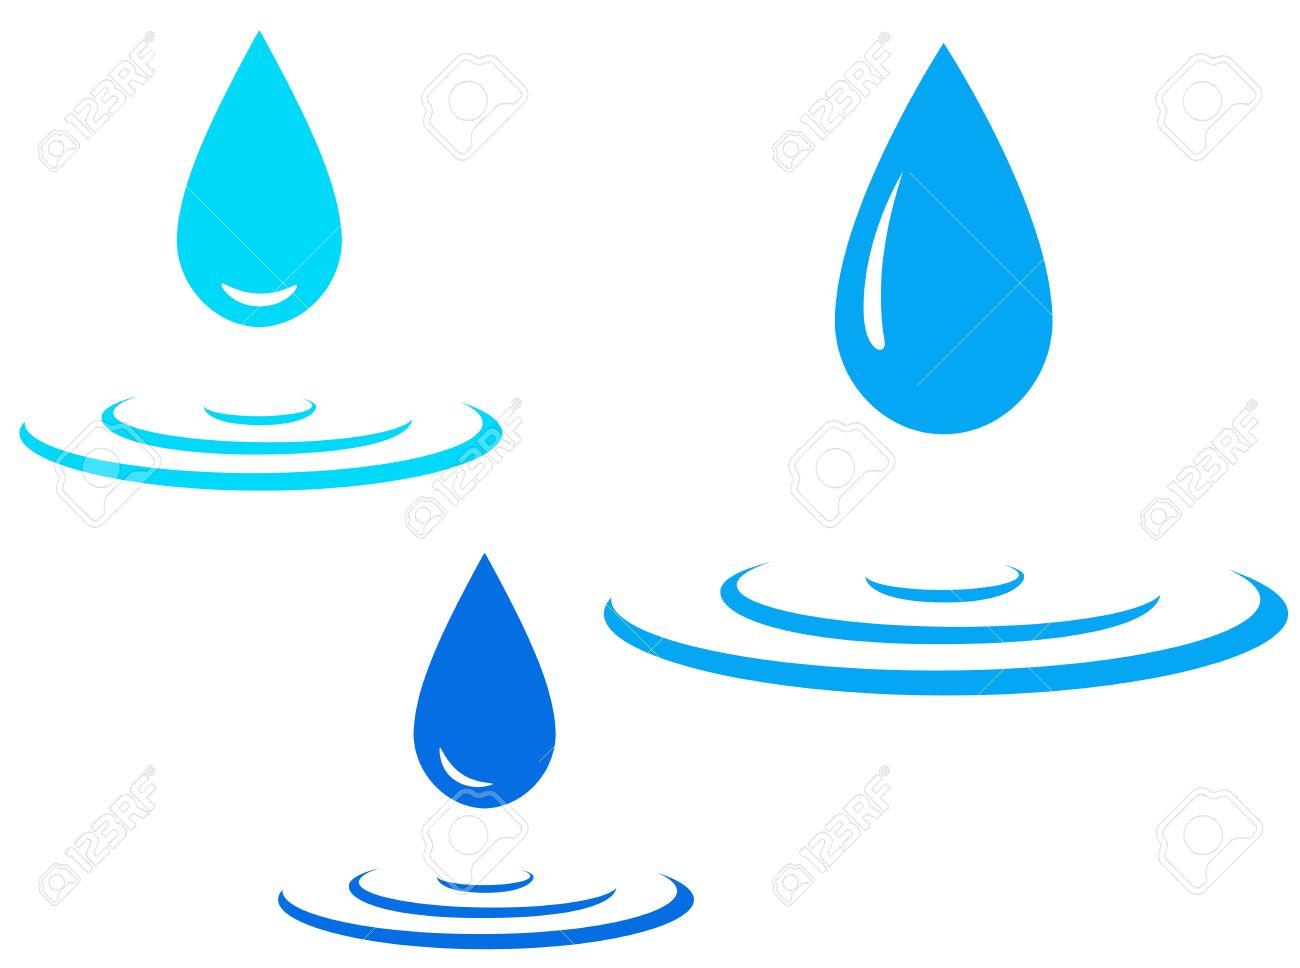 Water splash raindrop. Cliparts free download best